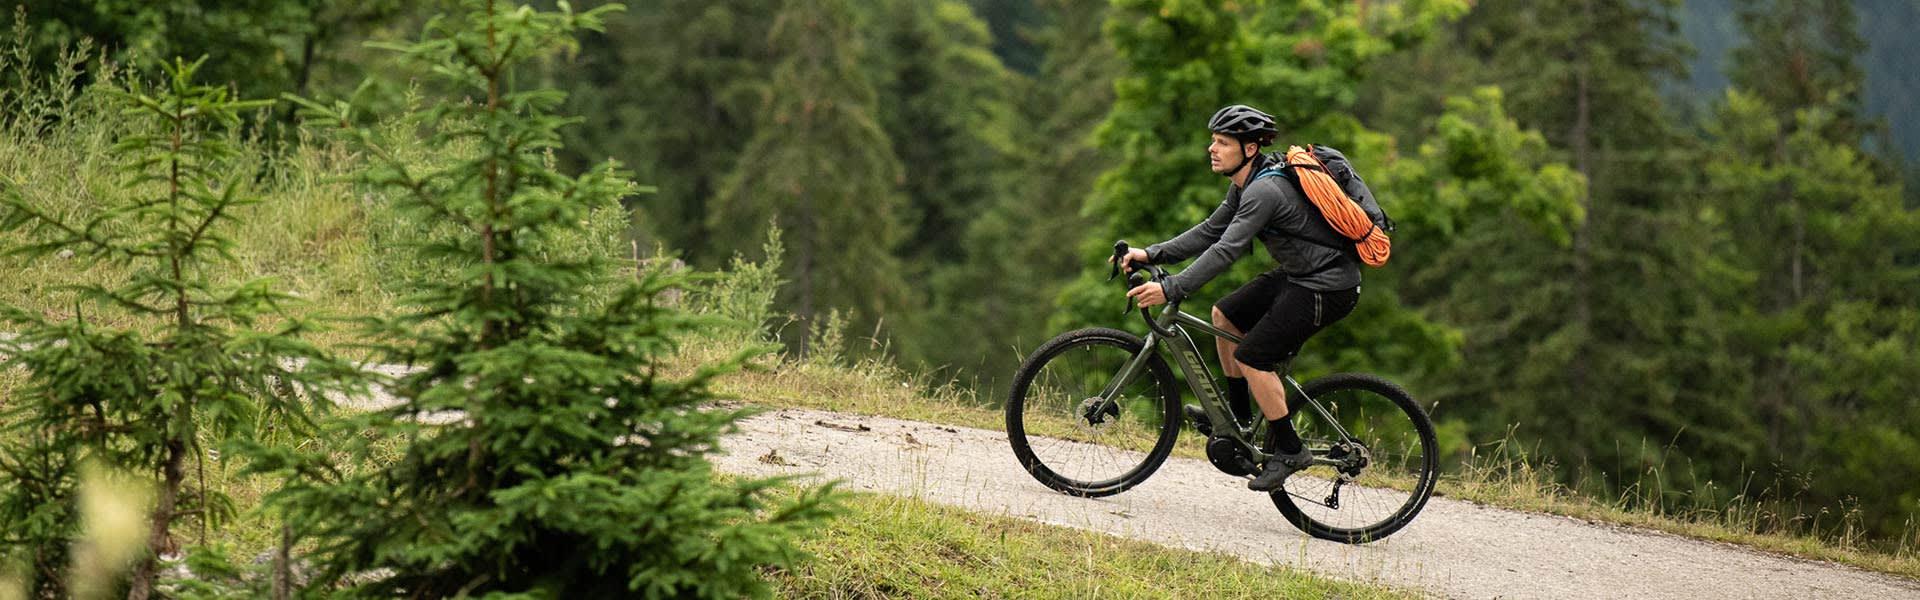 Adventure & Trekking E-bikes